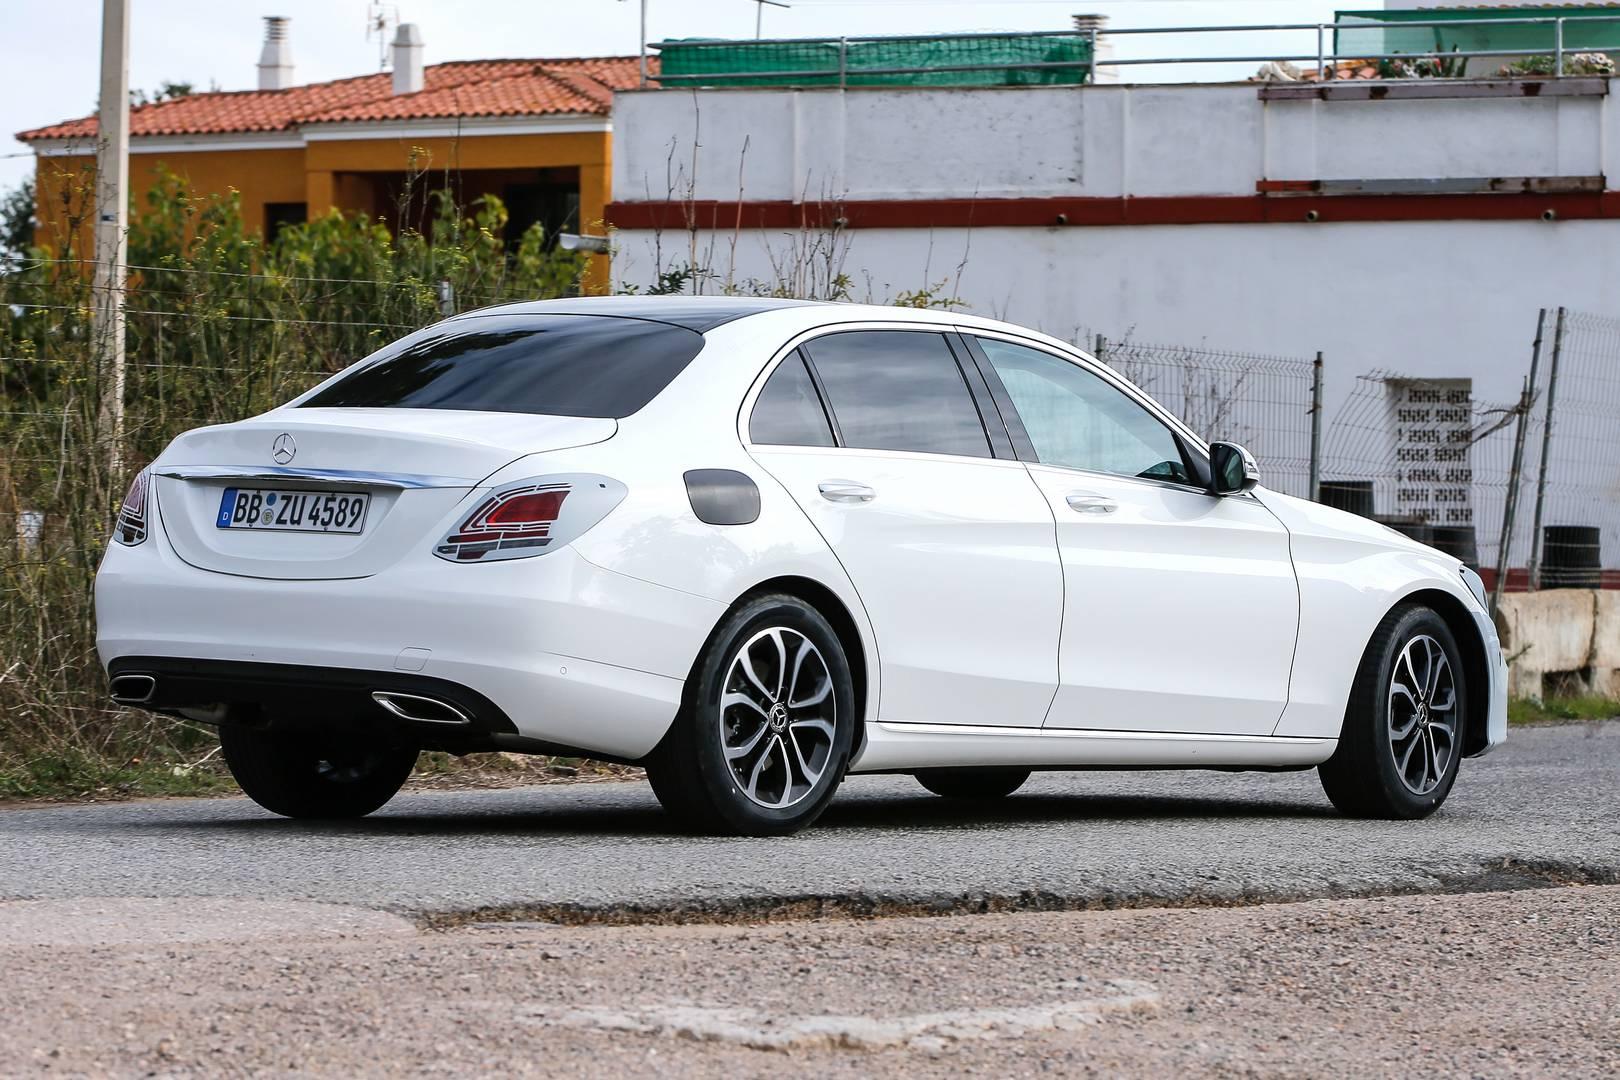 100 2018 mercedes benz c class c class luxury for Mercedes benz new london ct